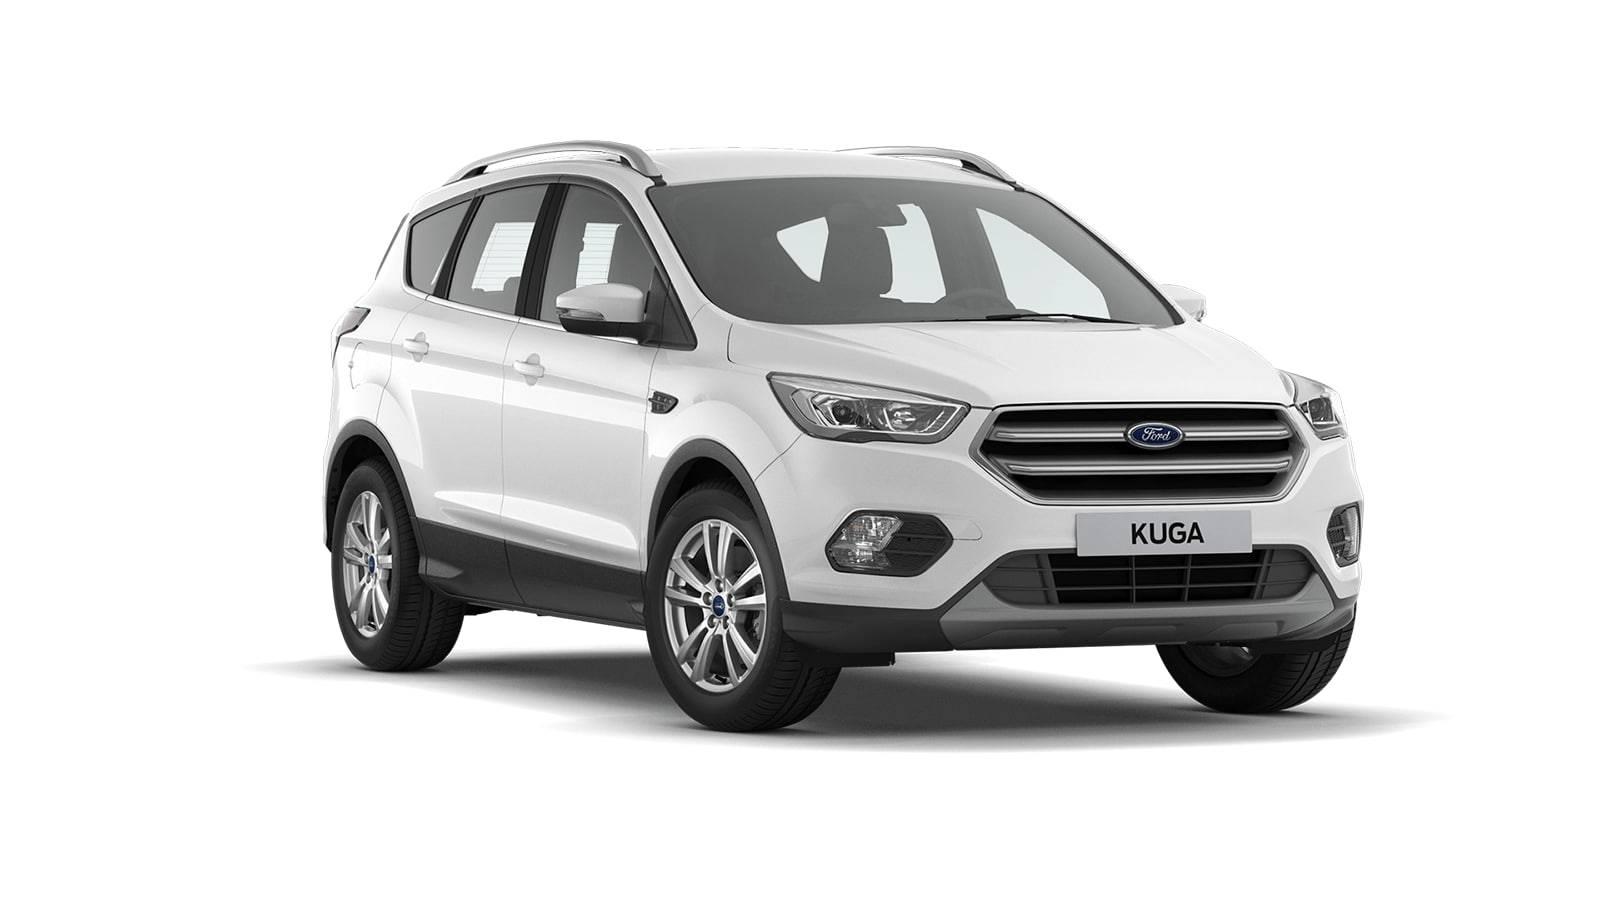 FORD KUGA 1.5 6-АКП (150 Л.С.) AWD Trend Plus